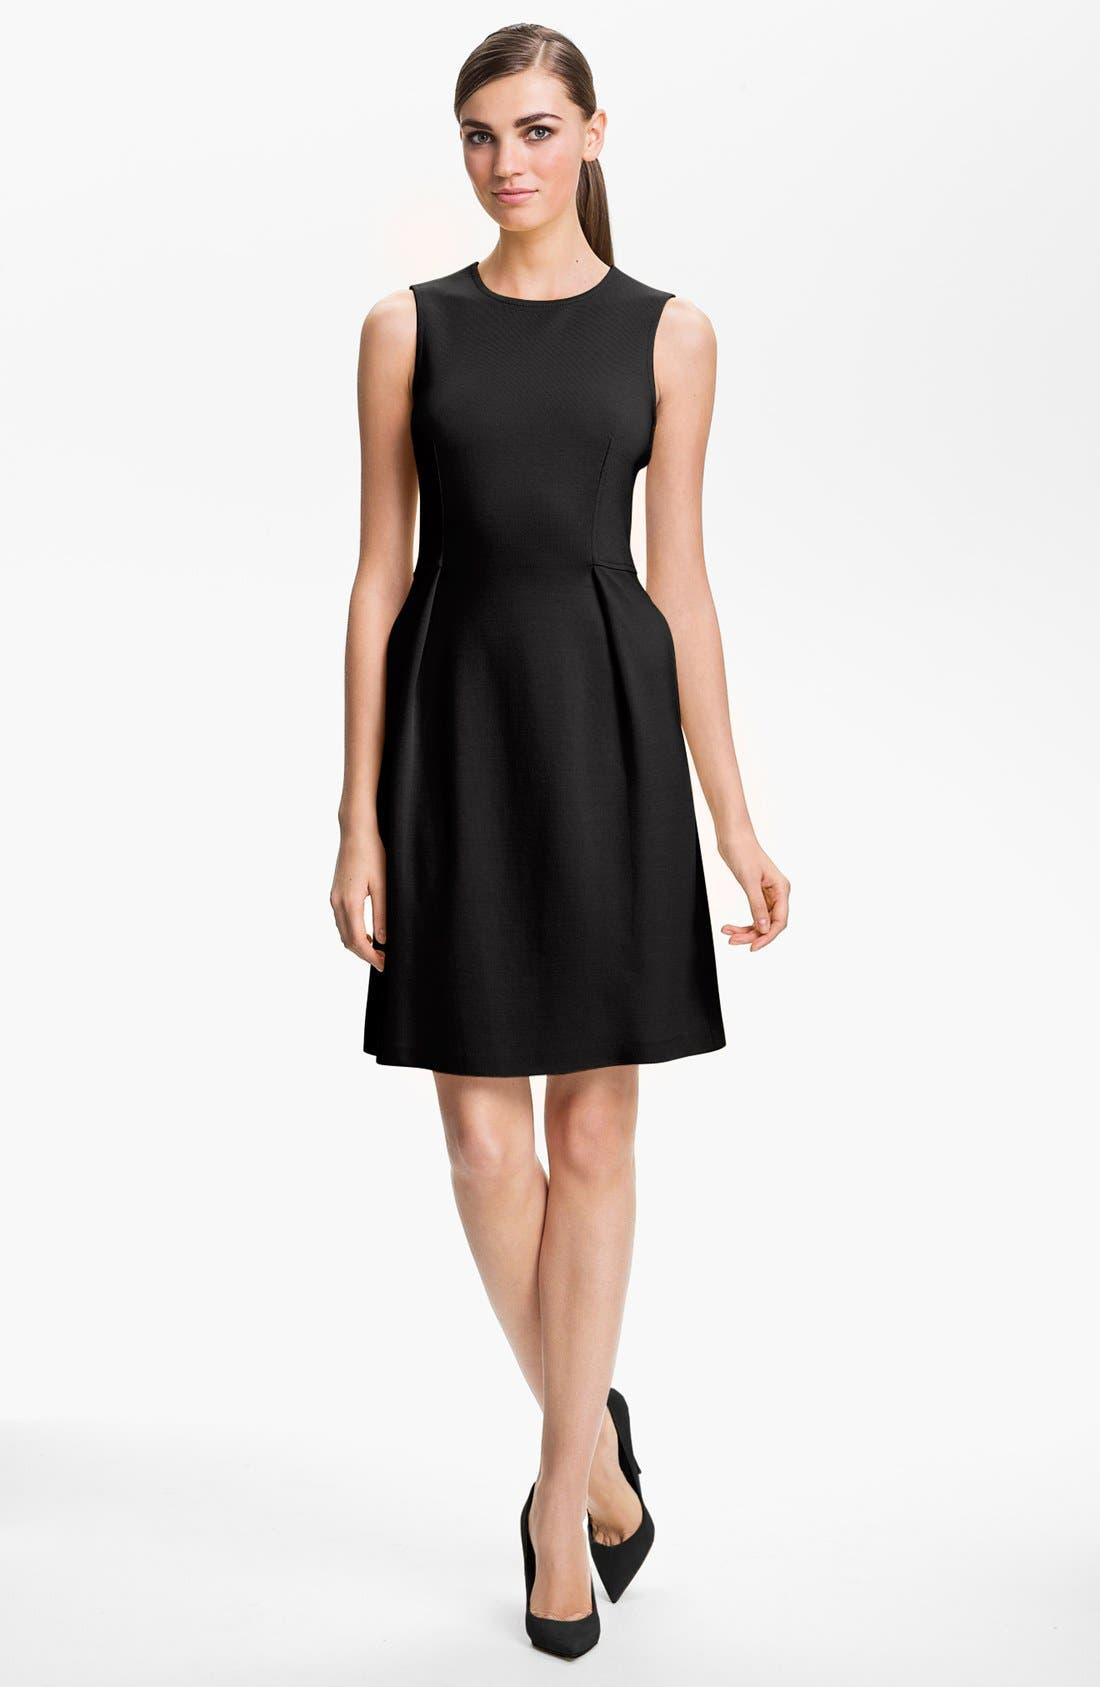 Alternate Image 1 Selected - St. John Collection Sleeveless Milano Knit Dress